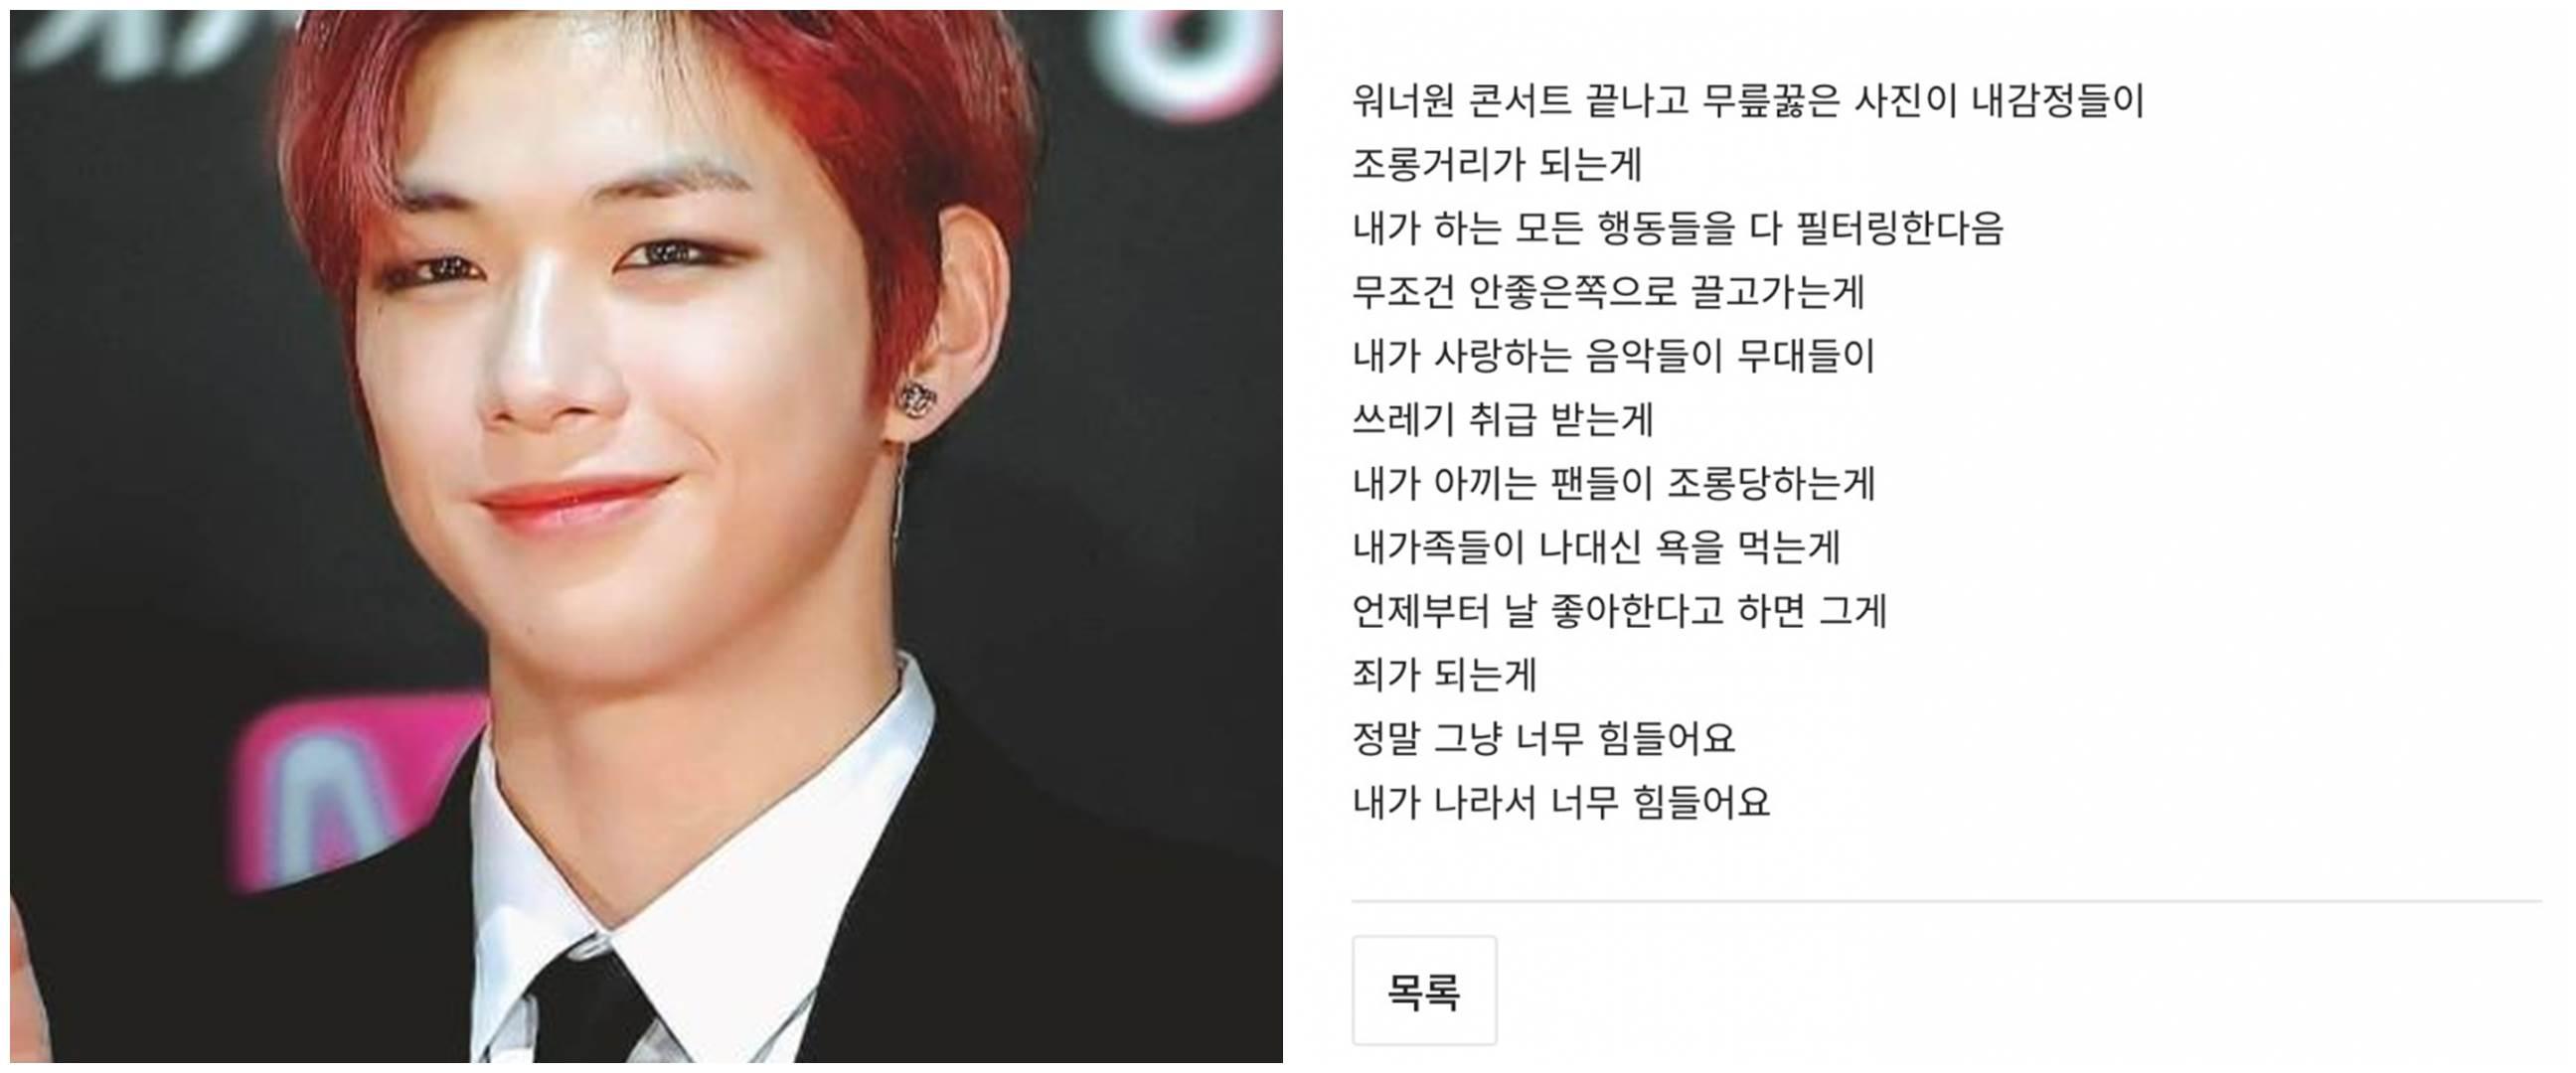 Kang Daniel Depresi, curhatannya bikin fans khawatir